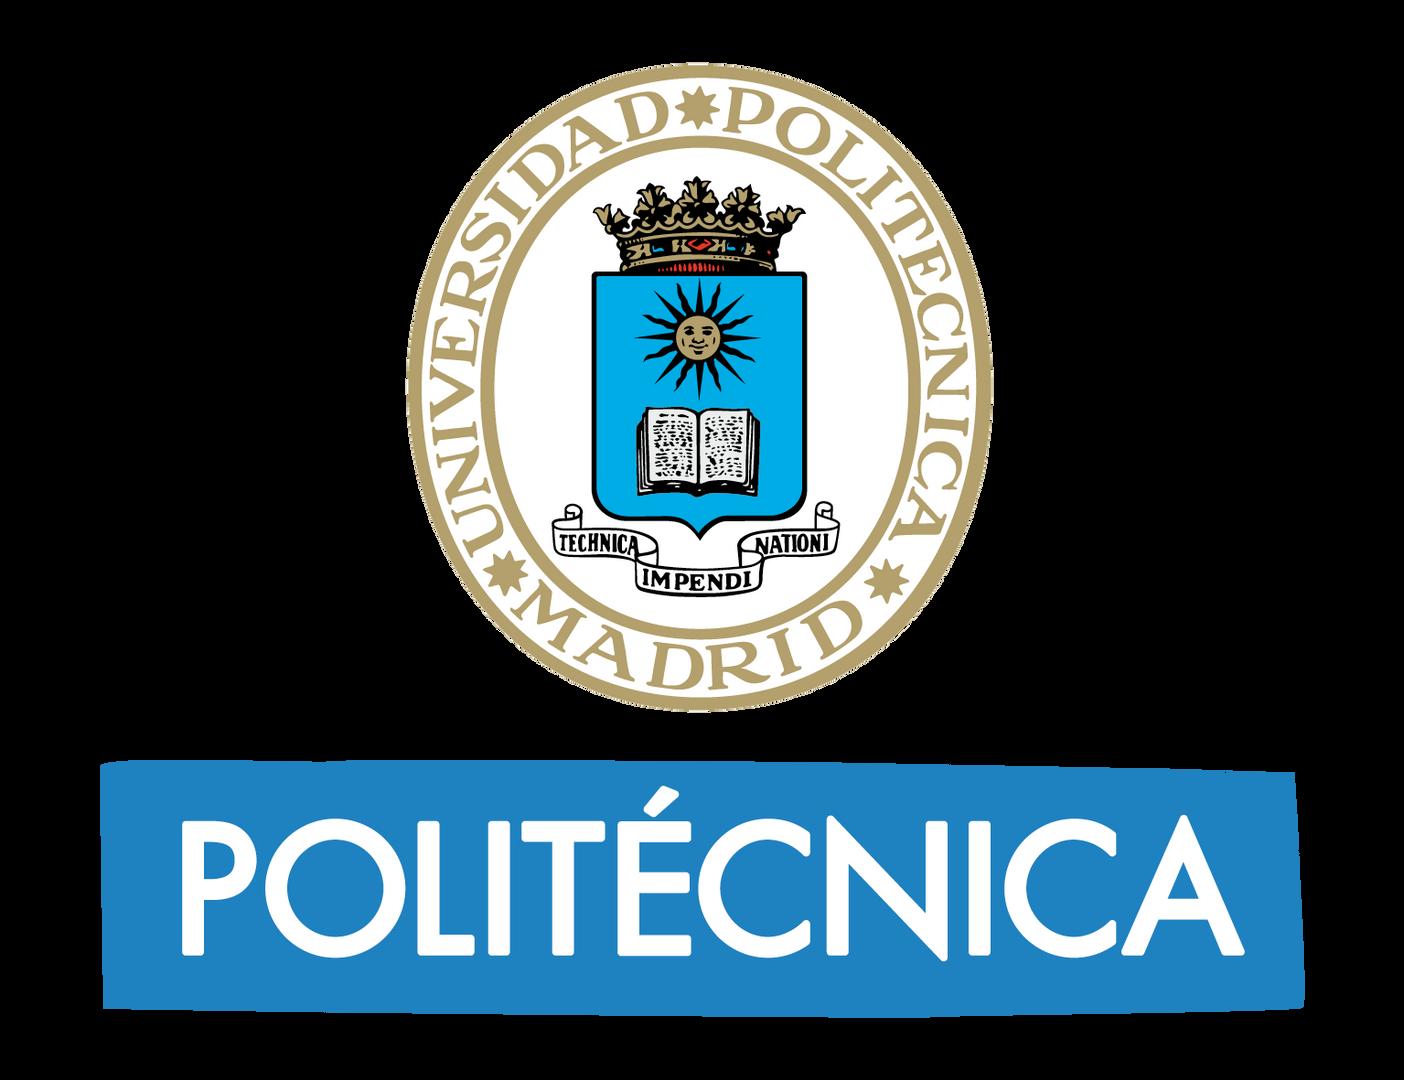 Logo universidad politecnica de madrid.p